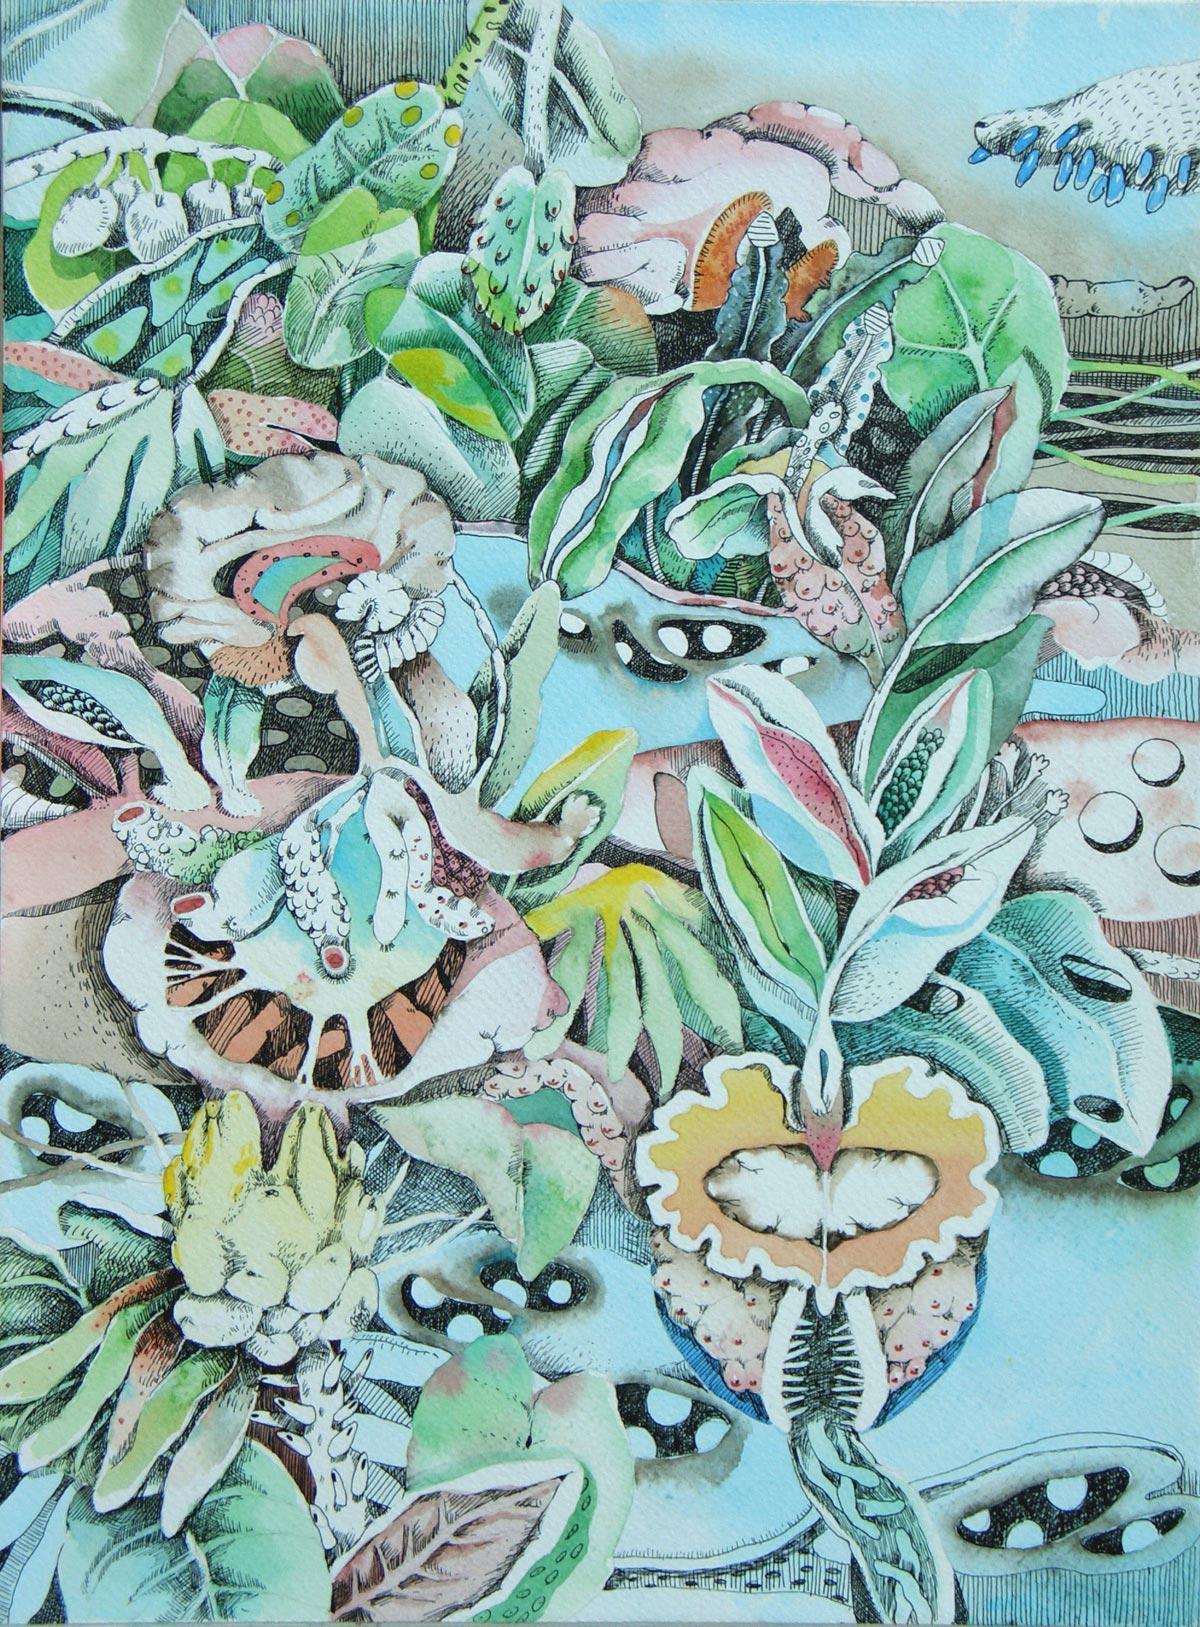 Metamorfosi Vegetali, 30x40, acquerello e chine su carta intelaiata, 2010